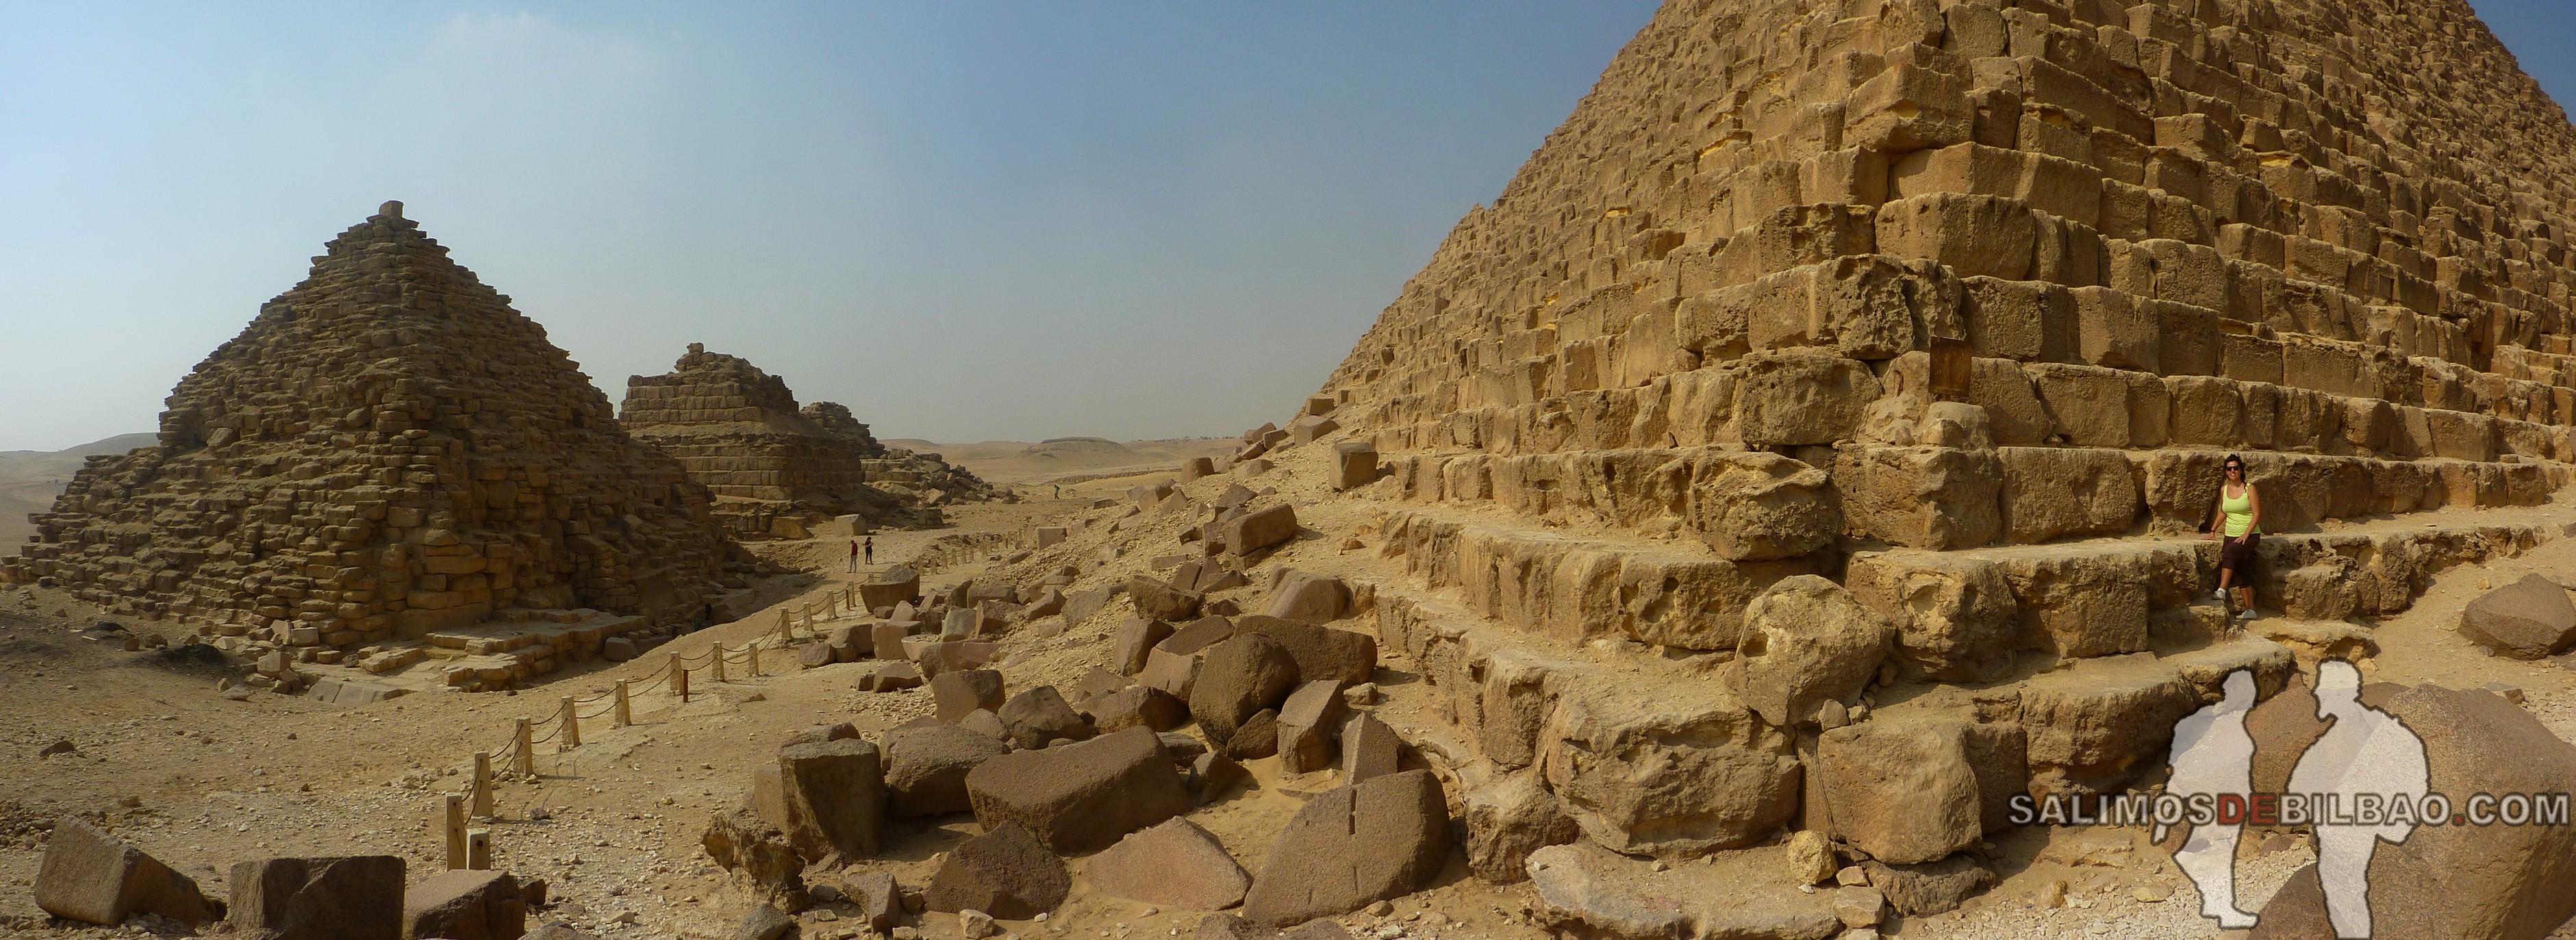 0109. Saioa, Pano, Pirámide de Micerinos